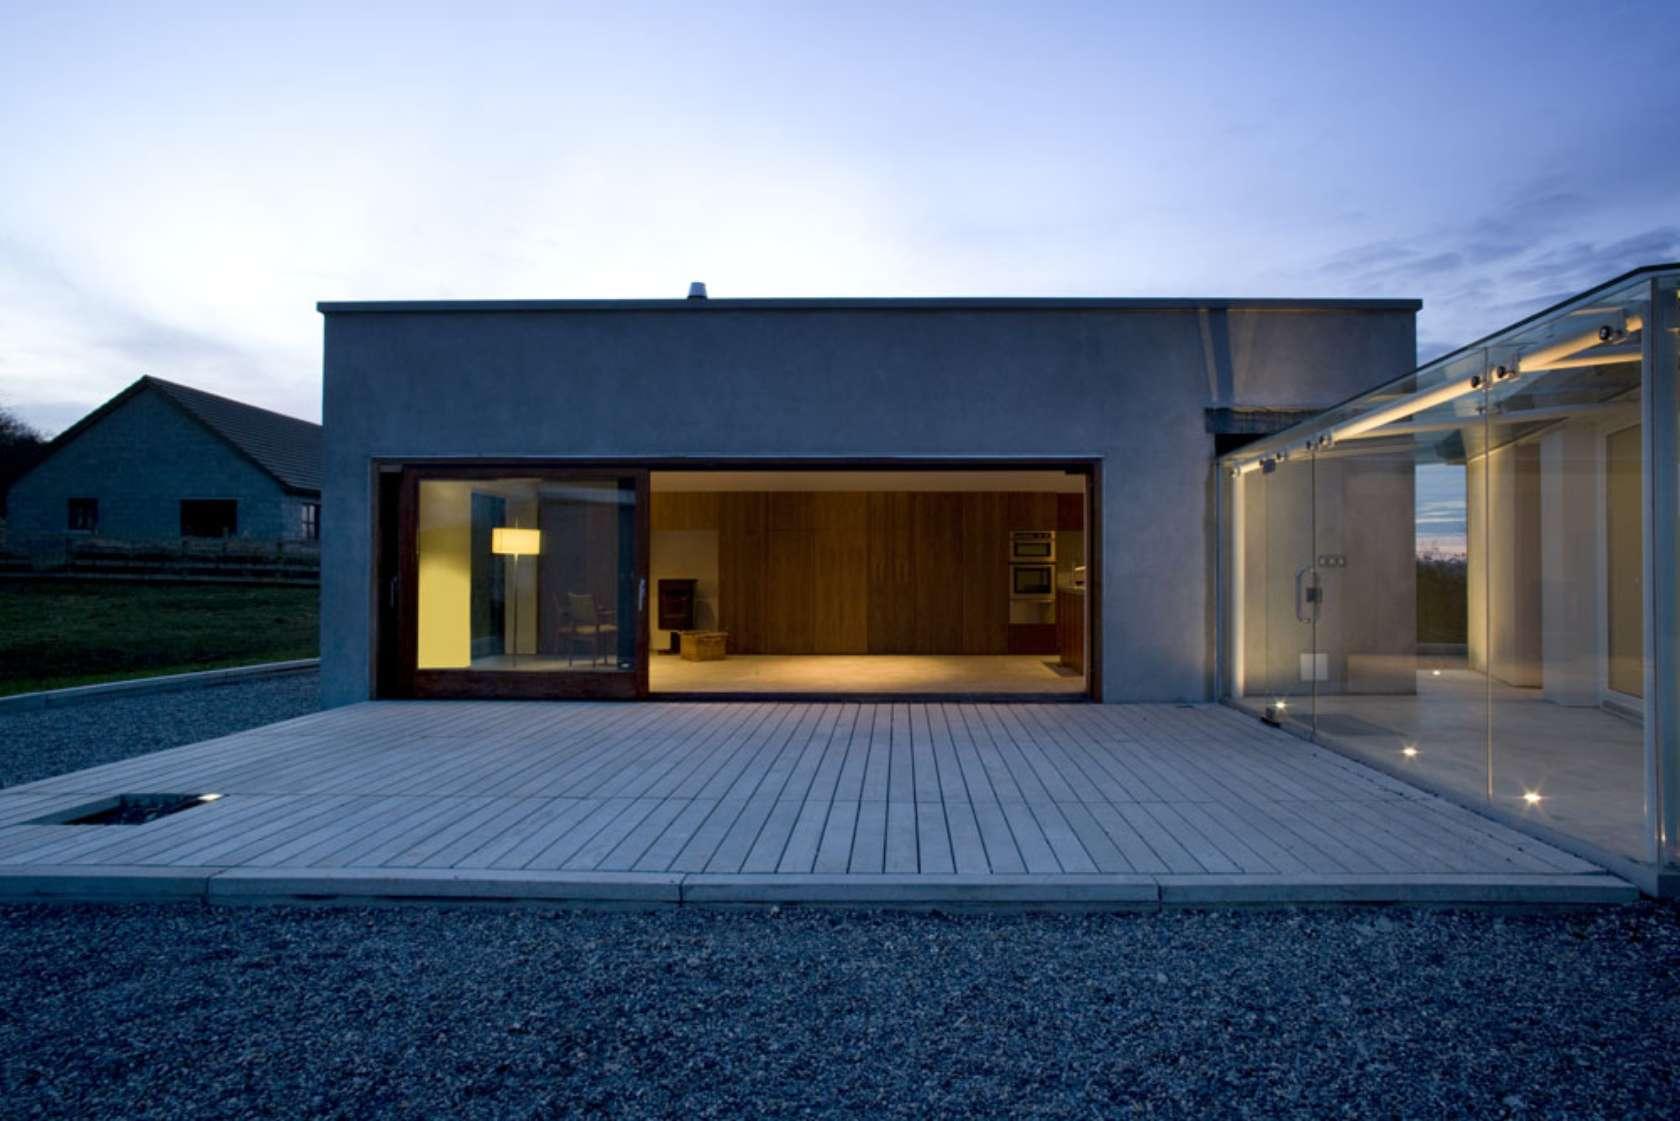 Loug derg architizer for Modern irish house architecture